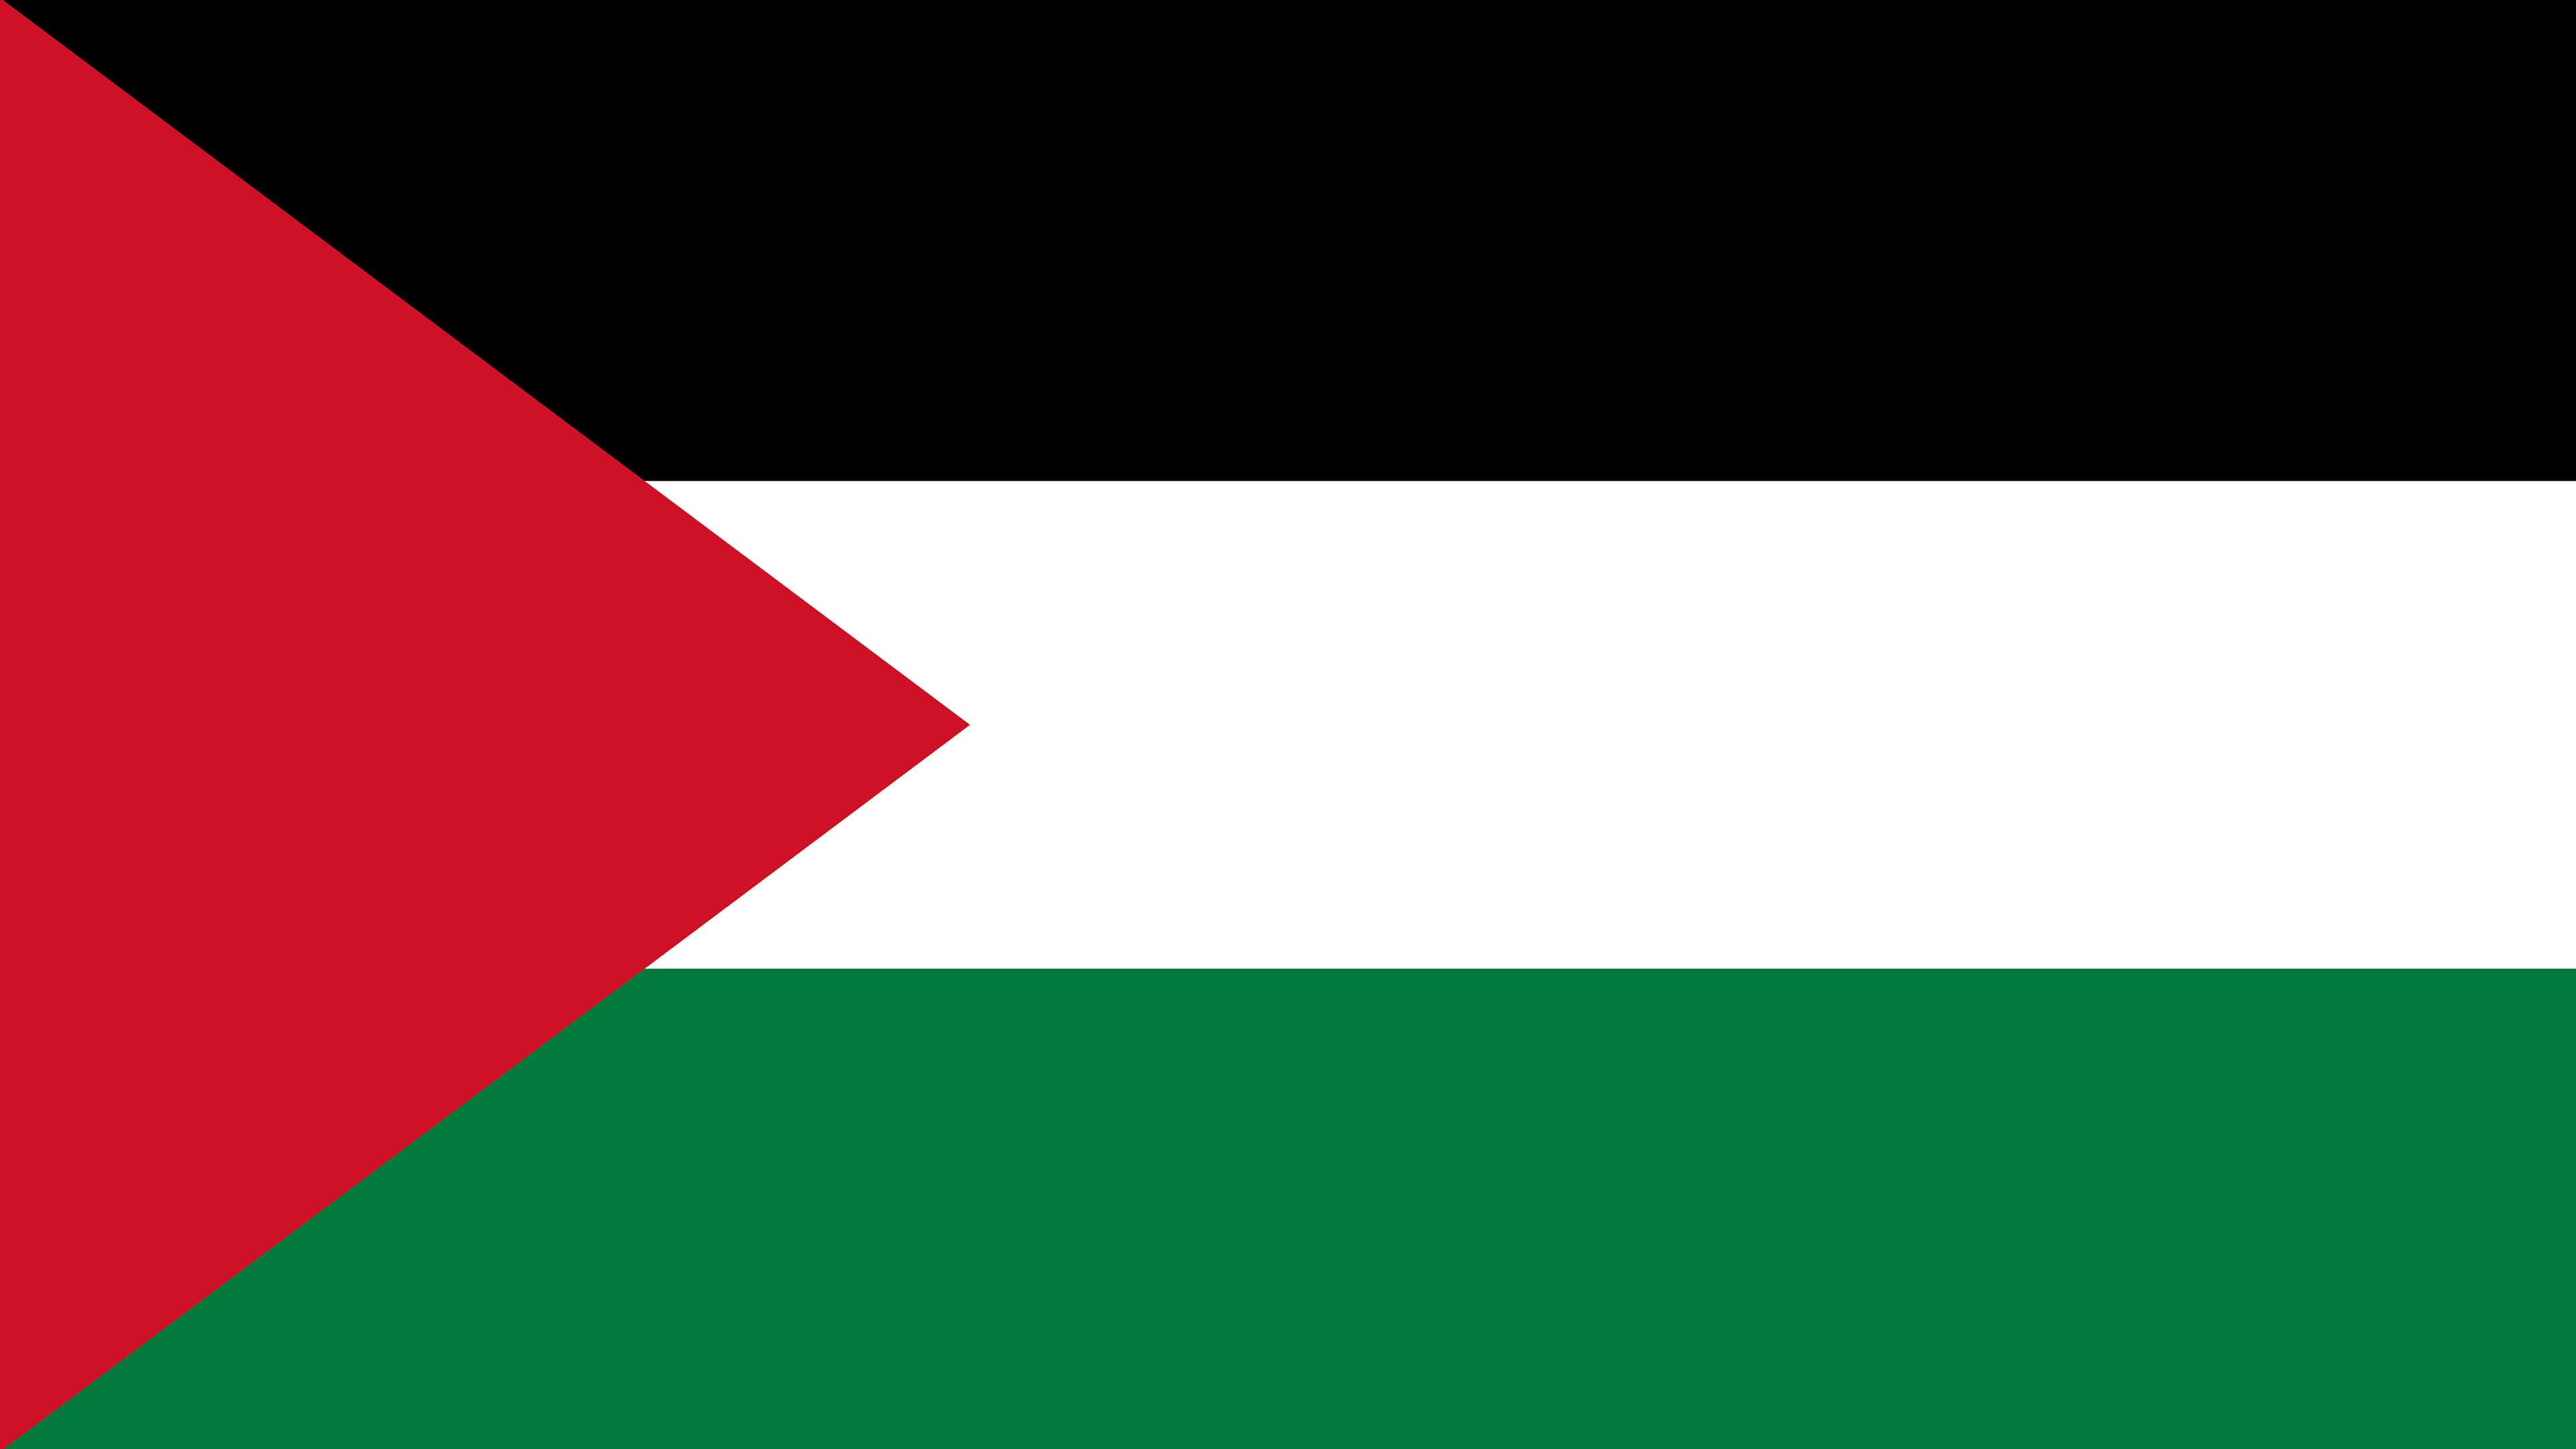 palestine flag uhd 4k wallpaper